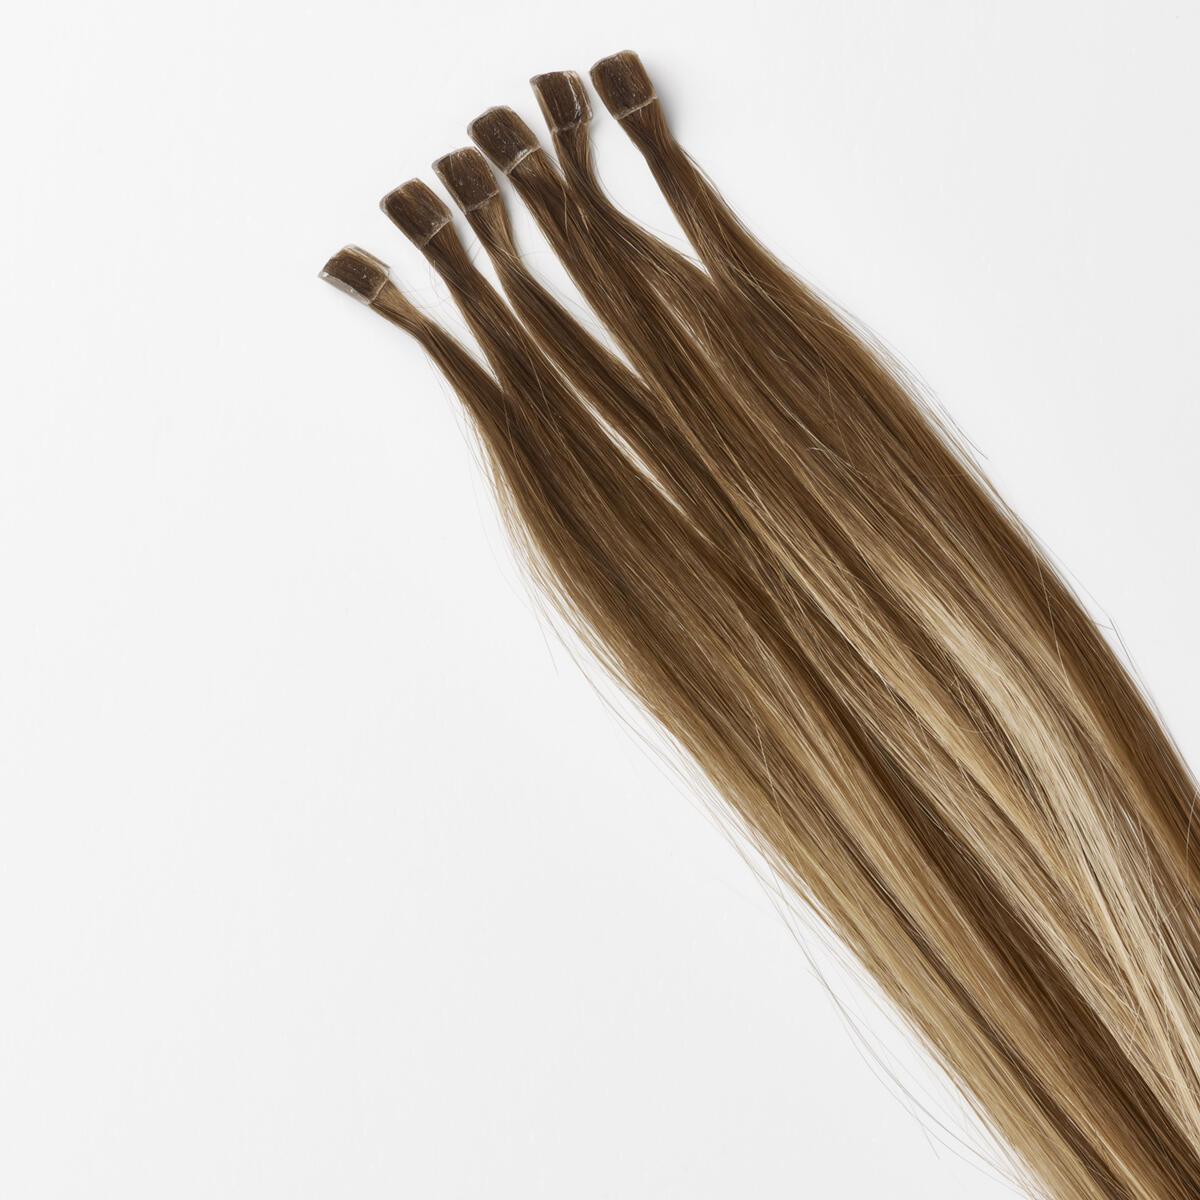 Nail Hair B5.0/8.3 Brownish Blonde Balayage 40 cm